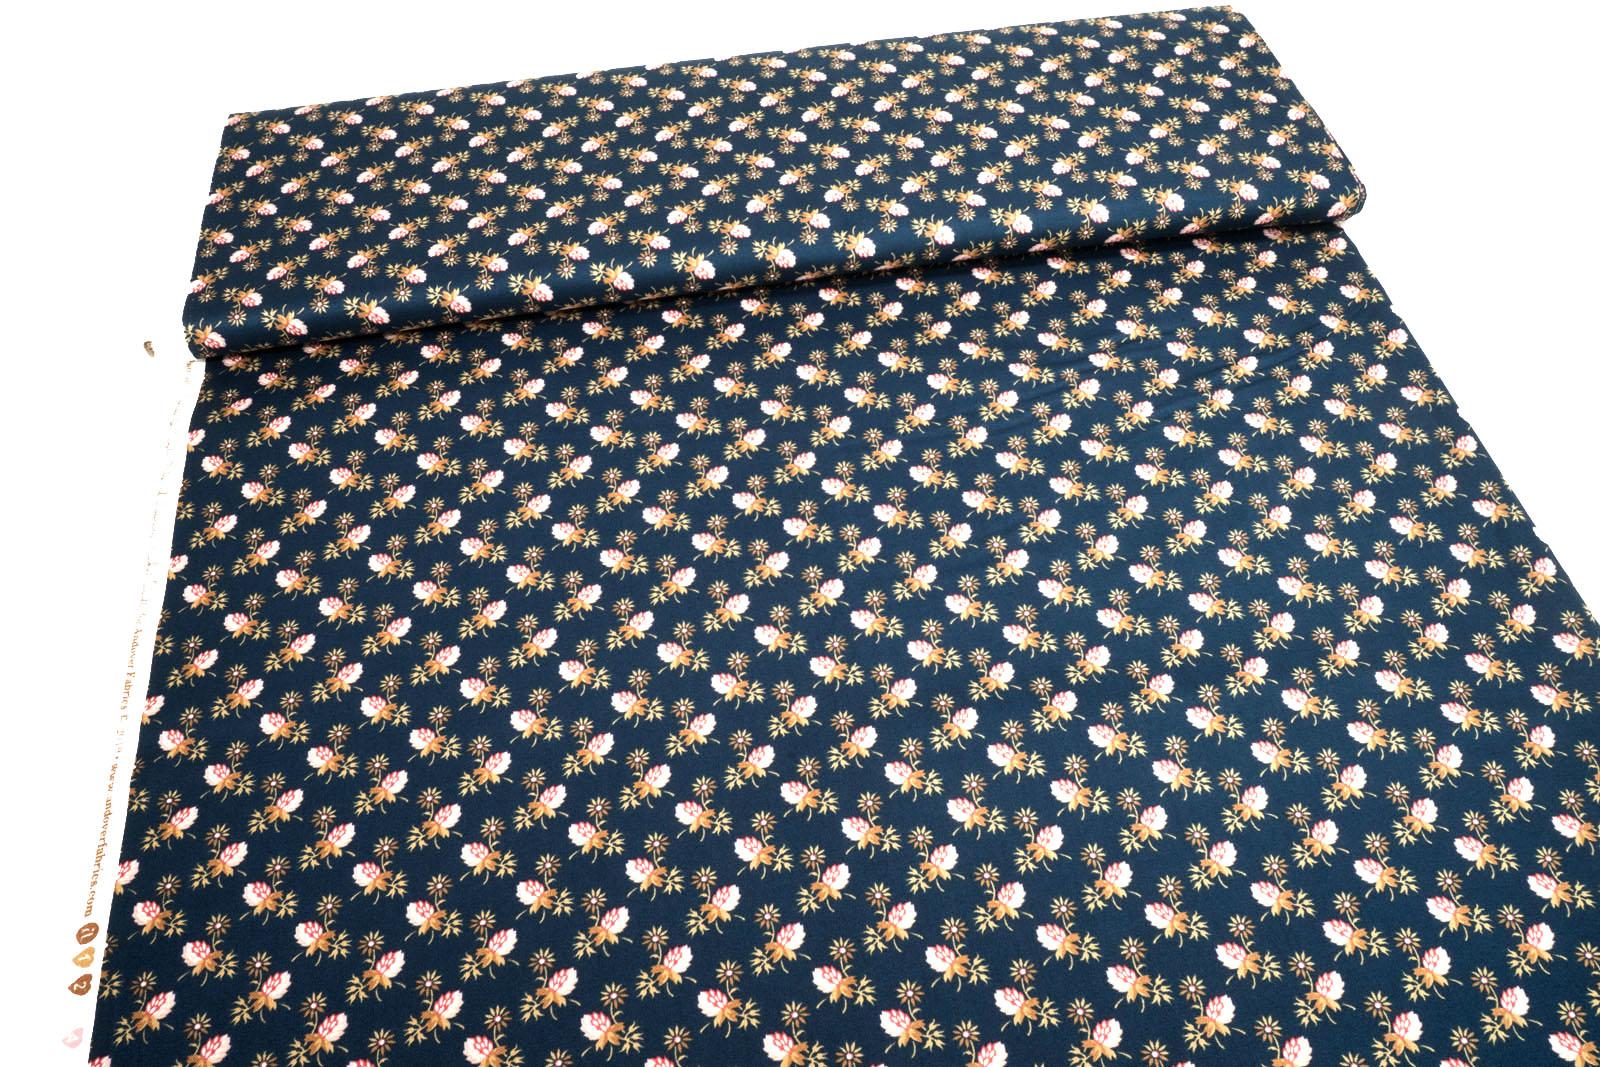 Andover Super Bloom Clover dusk 29451 Edyta Sitar of Laundry Basket Quilts 0,5m